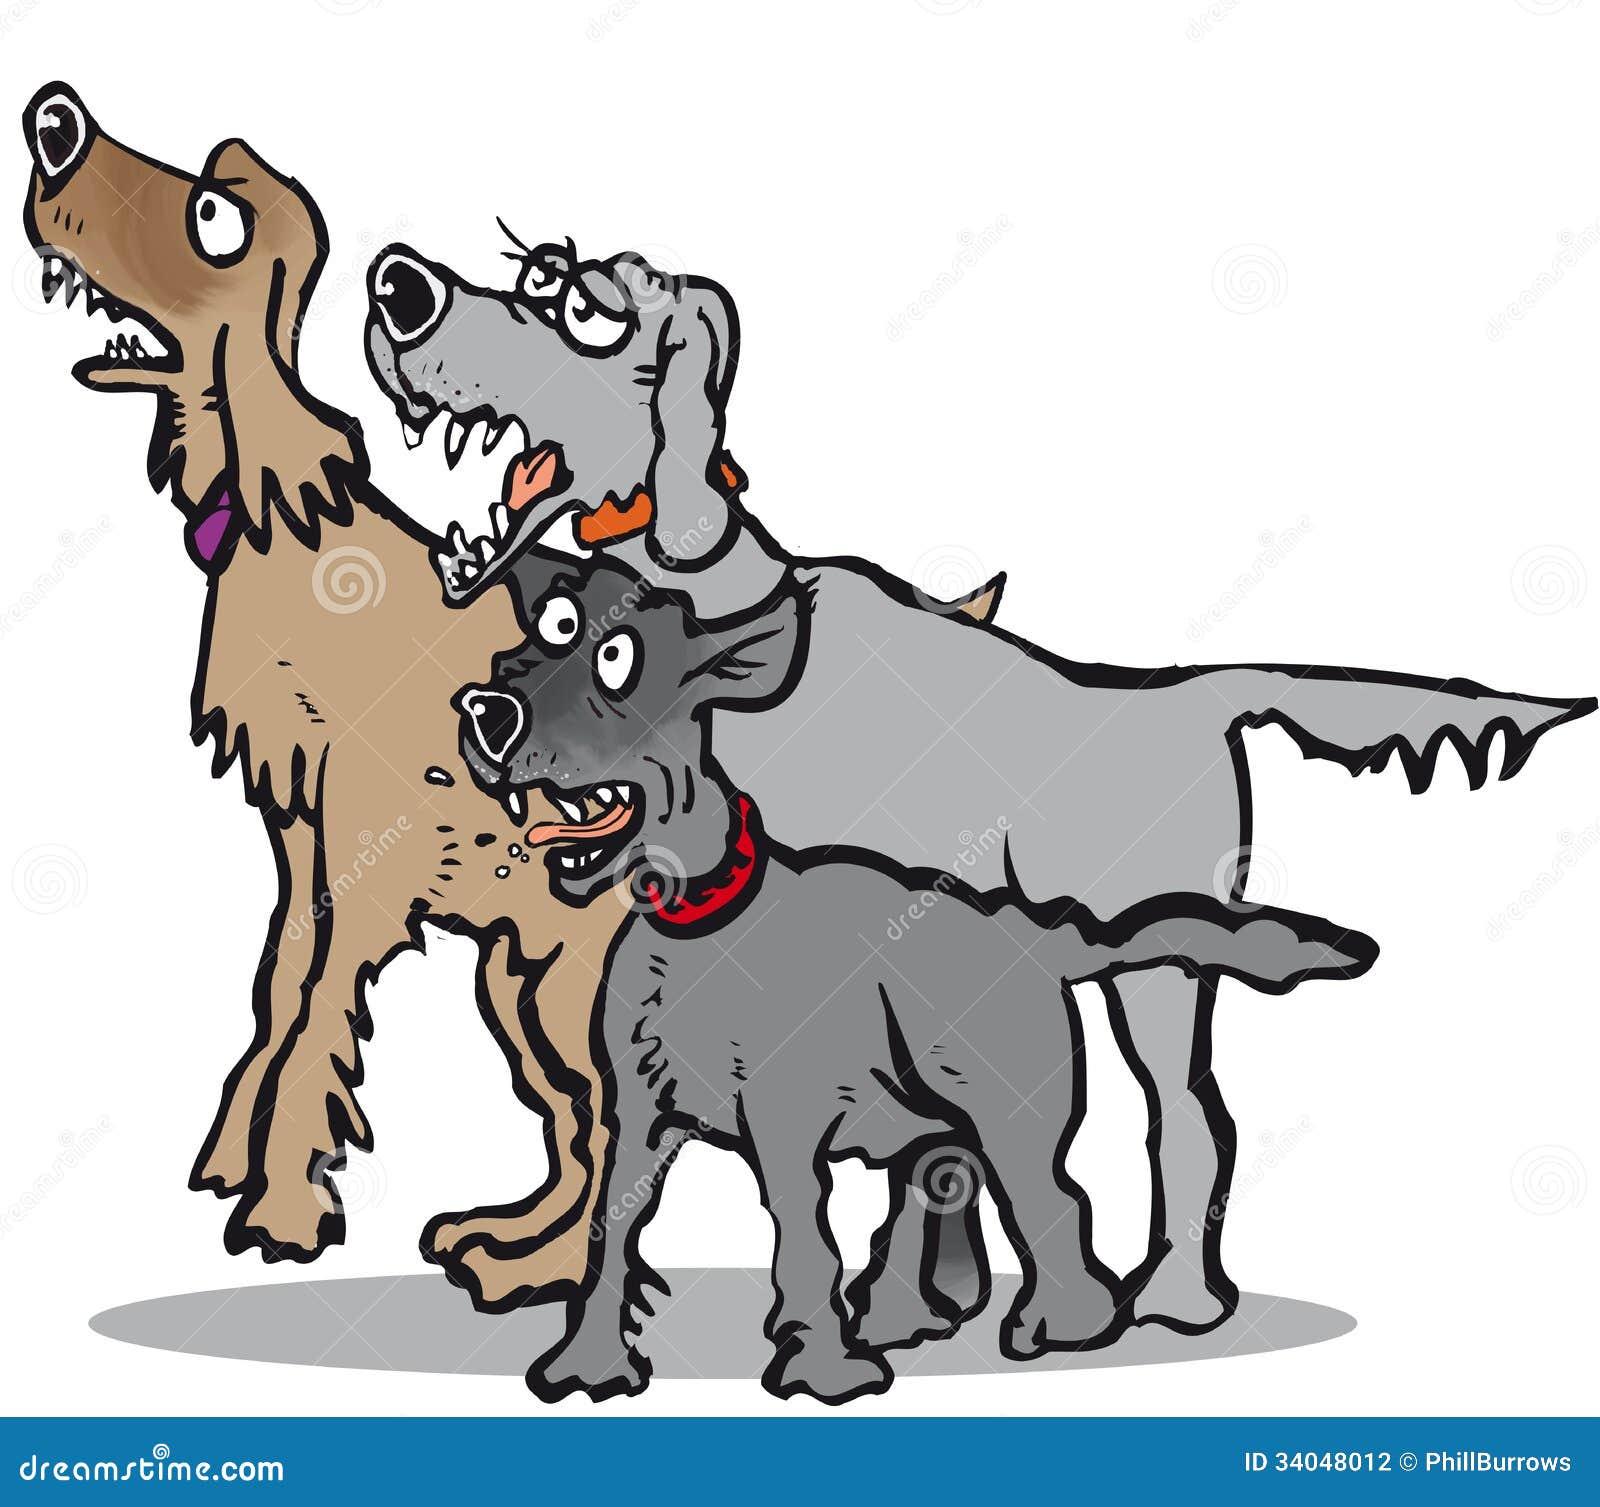 barking stock illustrations u20ac 2 094 barking stock illustrations rh dreamstime com black dog barking clipart